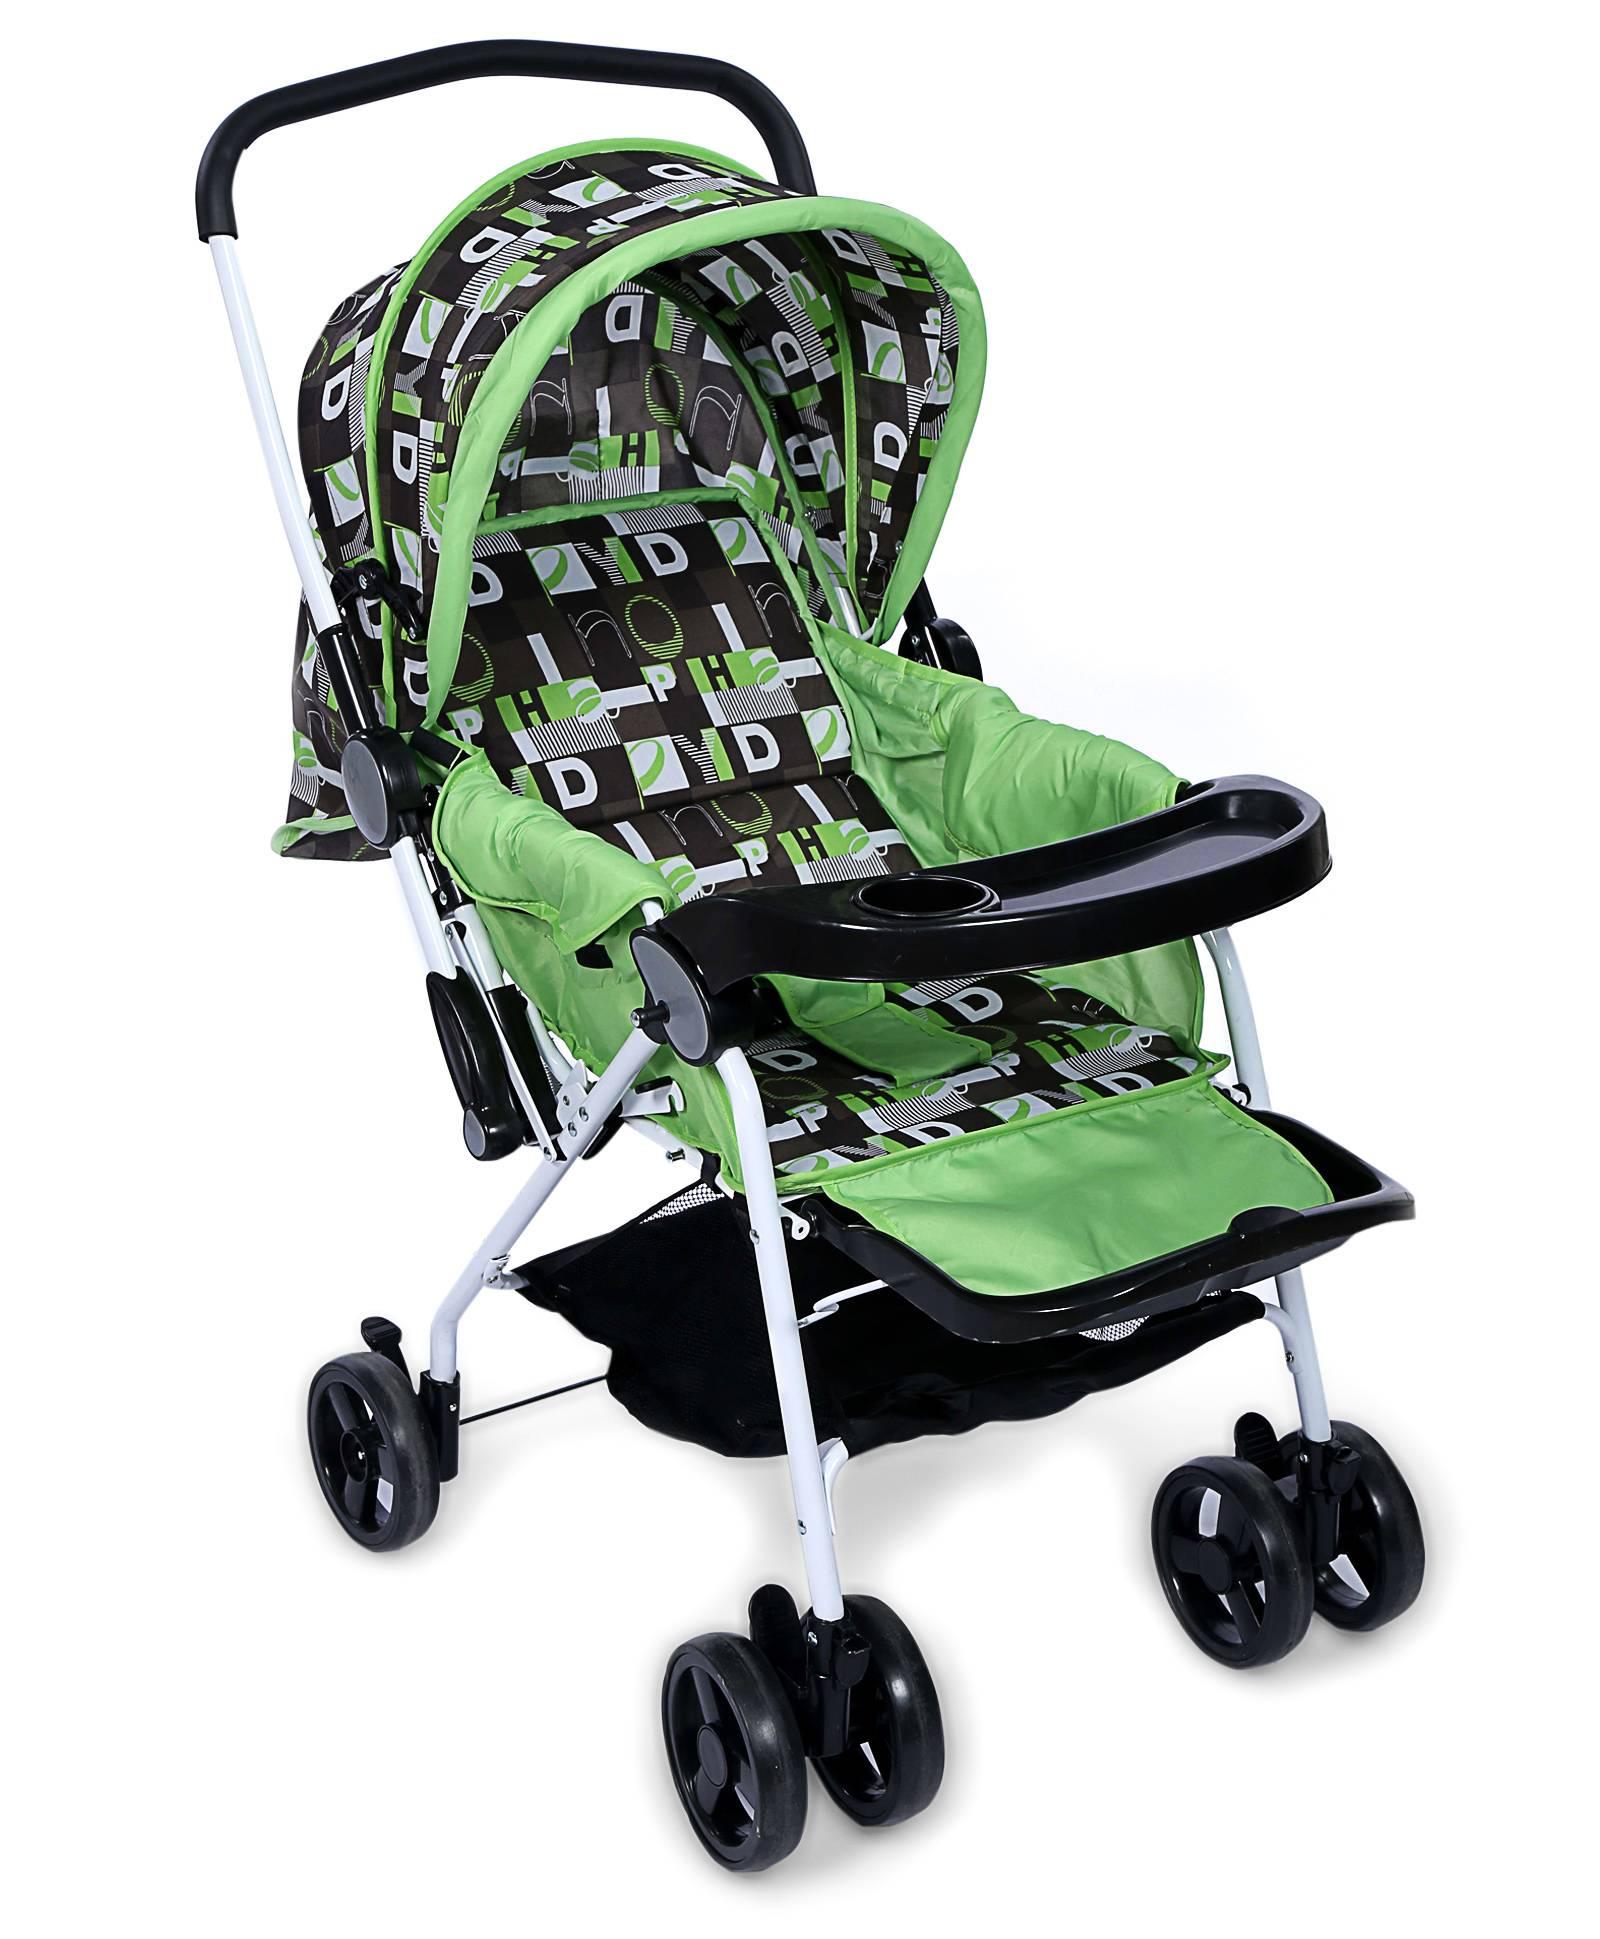 Baby Pram Cum Stroller Alphabet Print - Green And Black